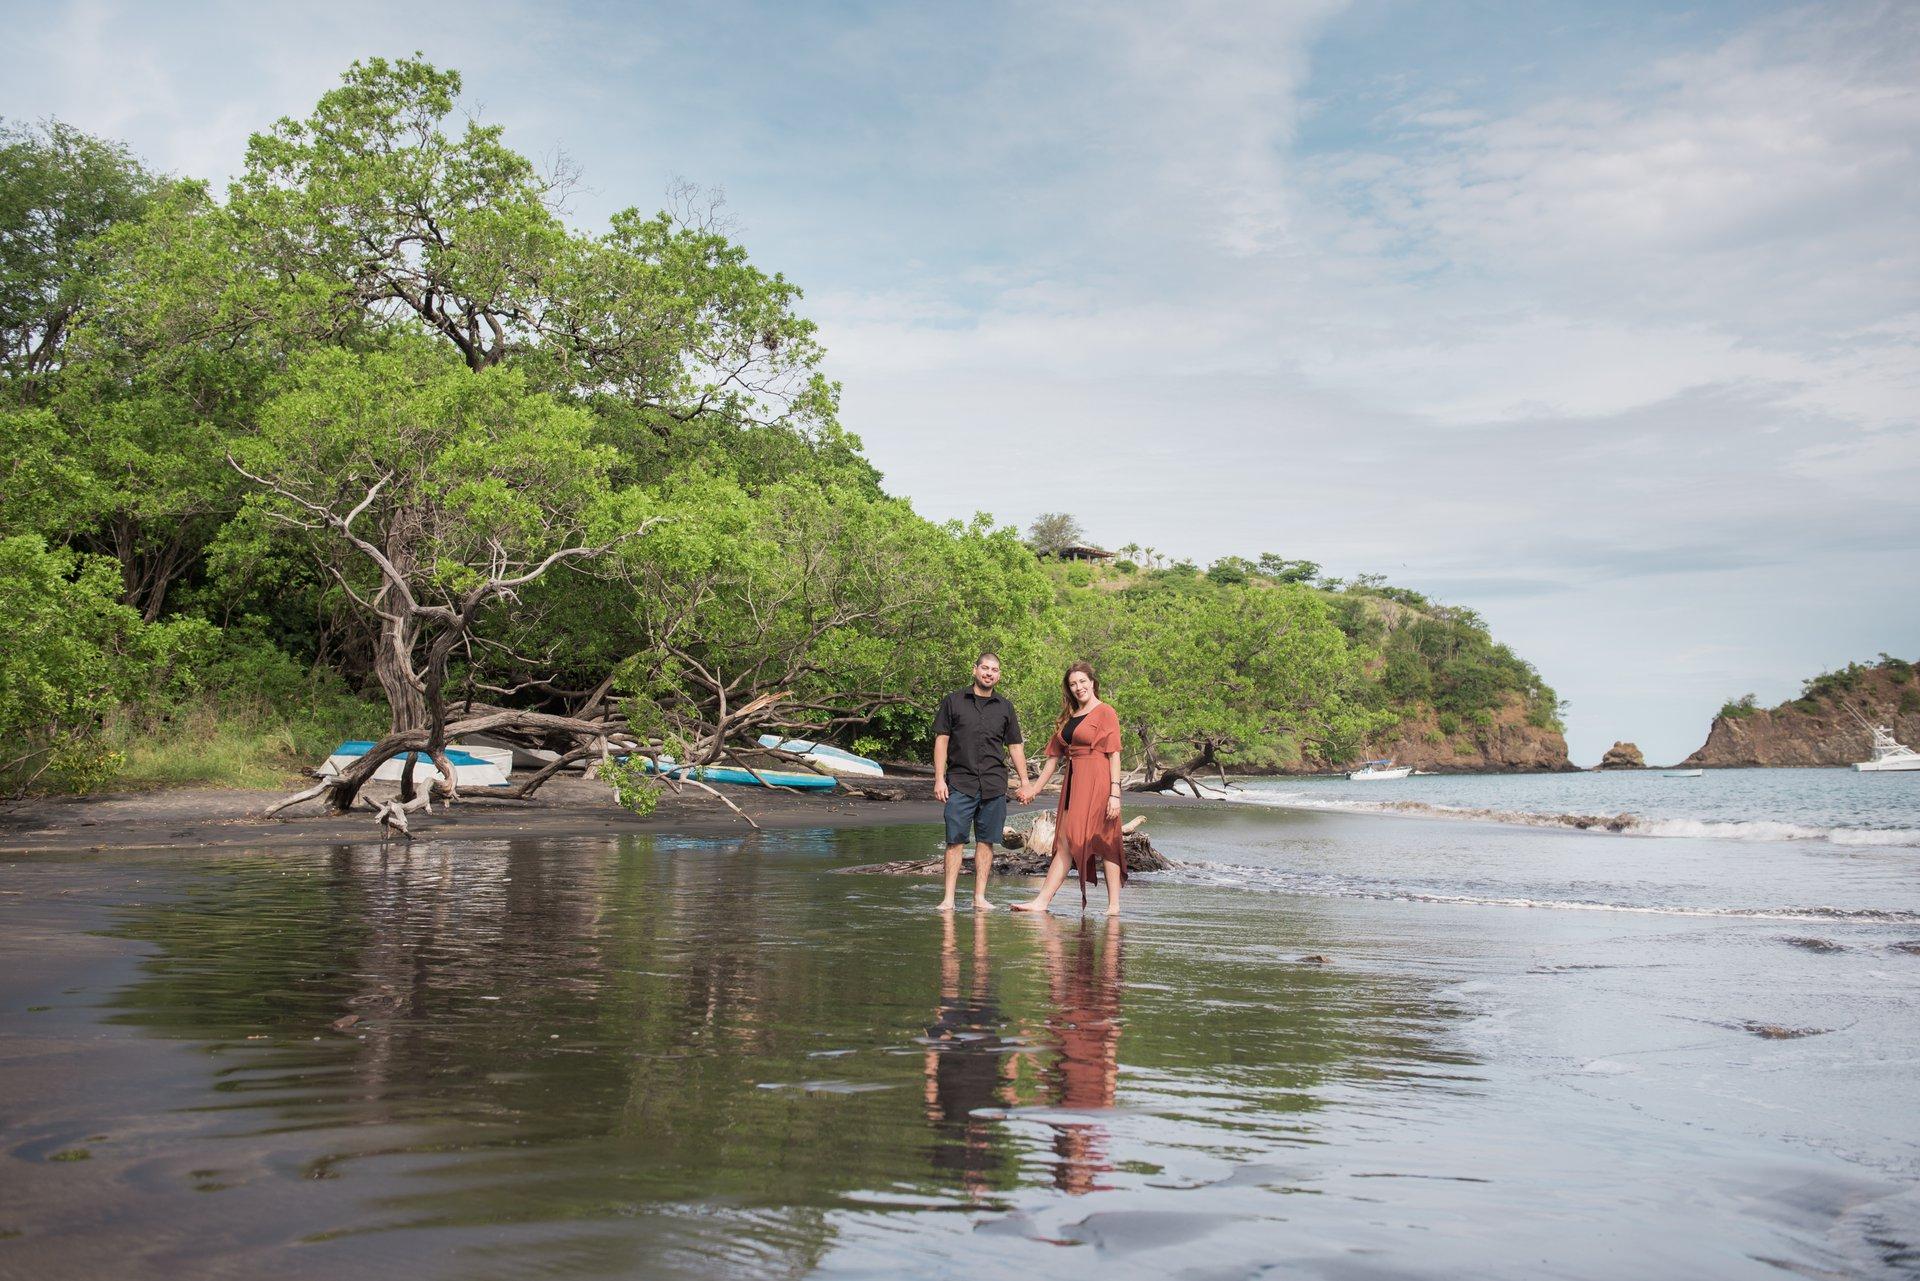 Guanacaste-Costa Rica-travel-story-Flytographer-12